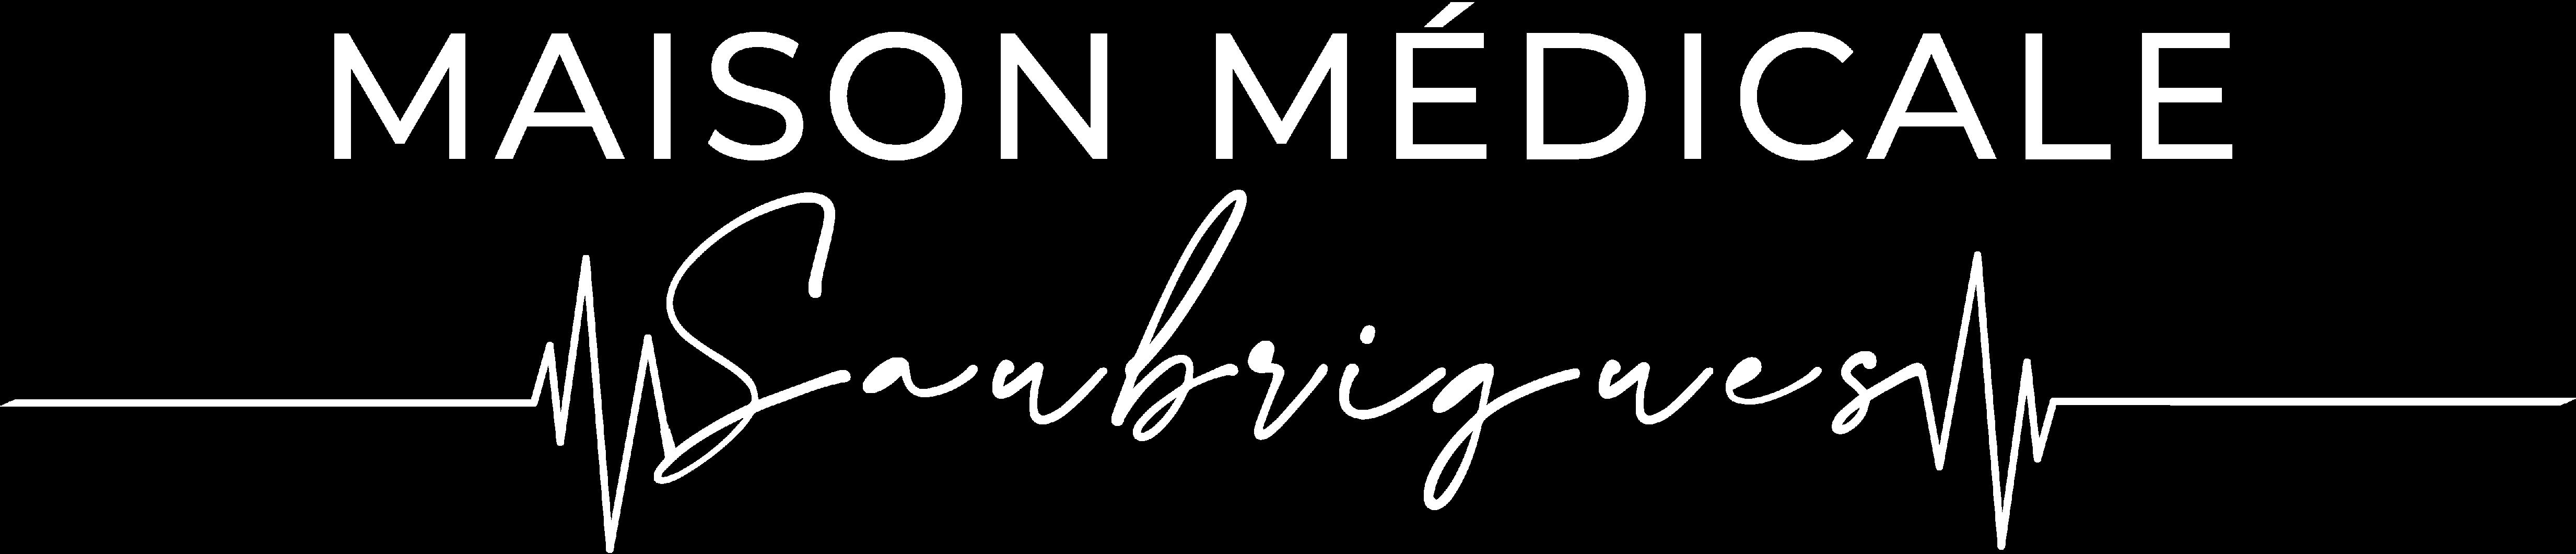 logo-mms-blanc